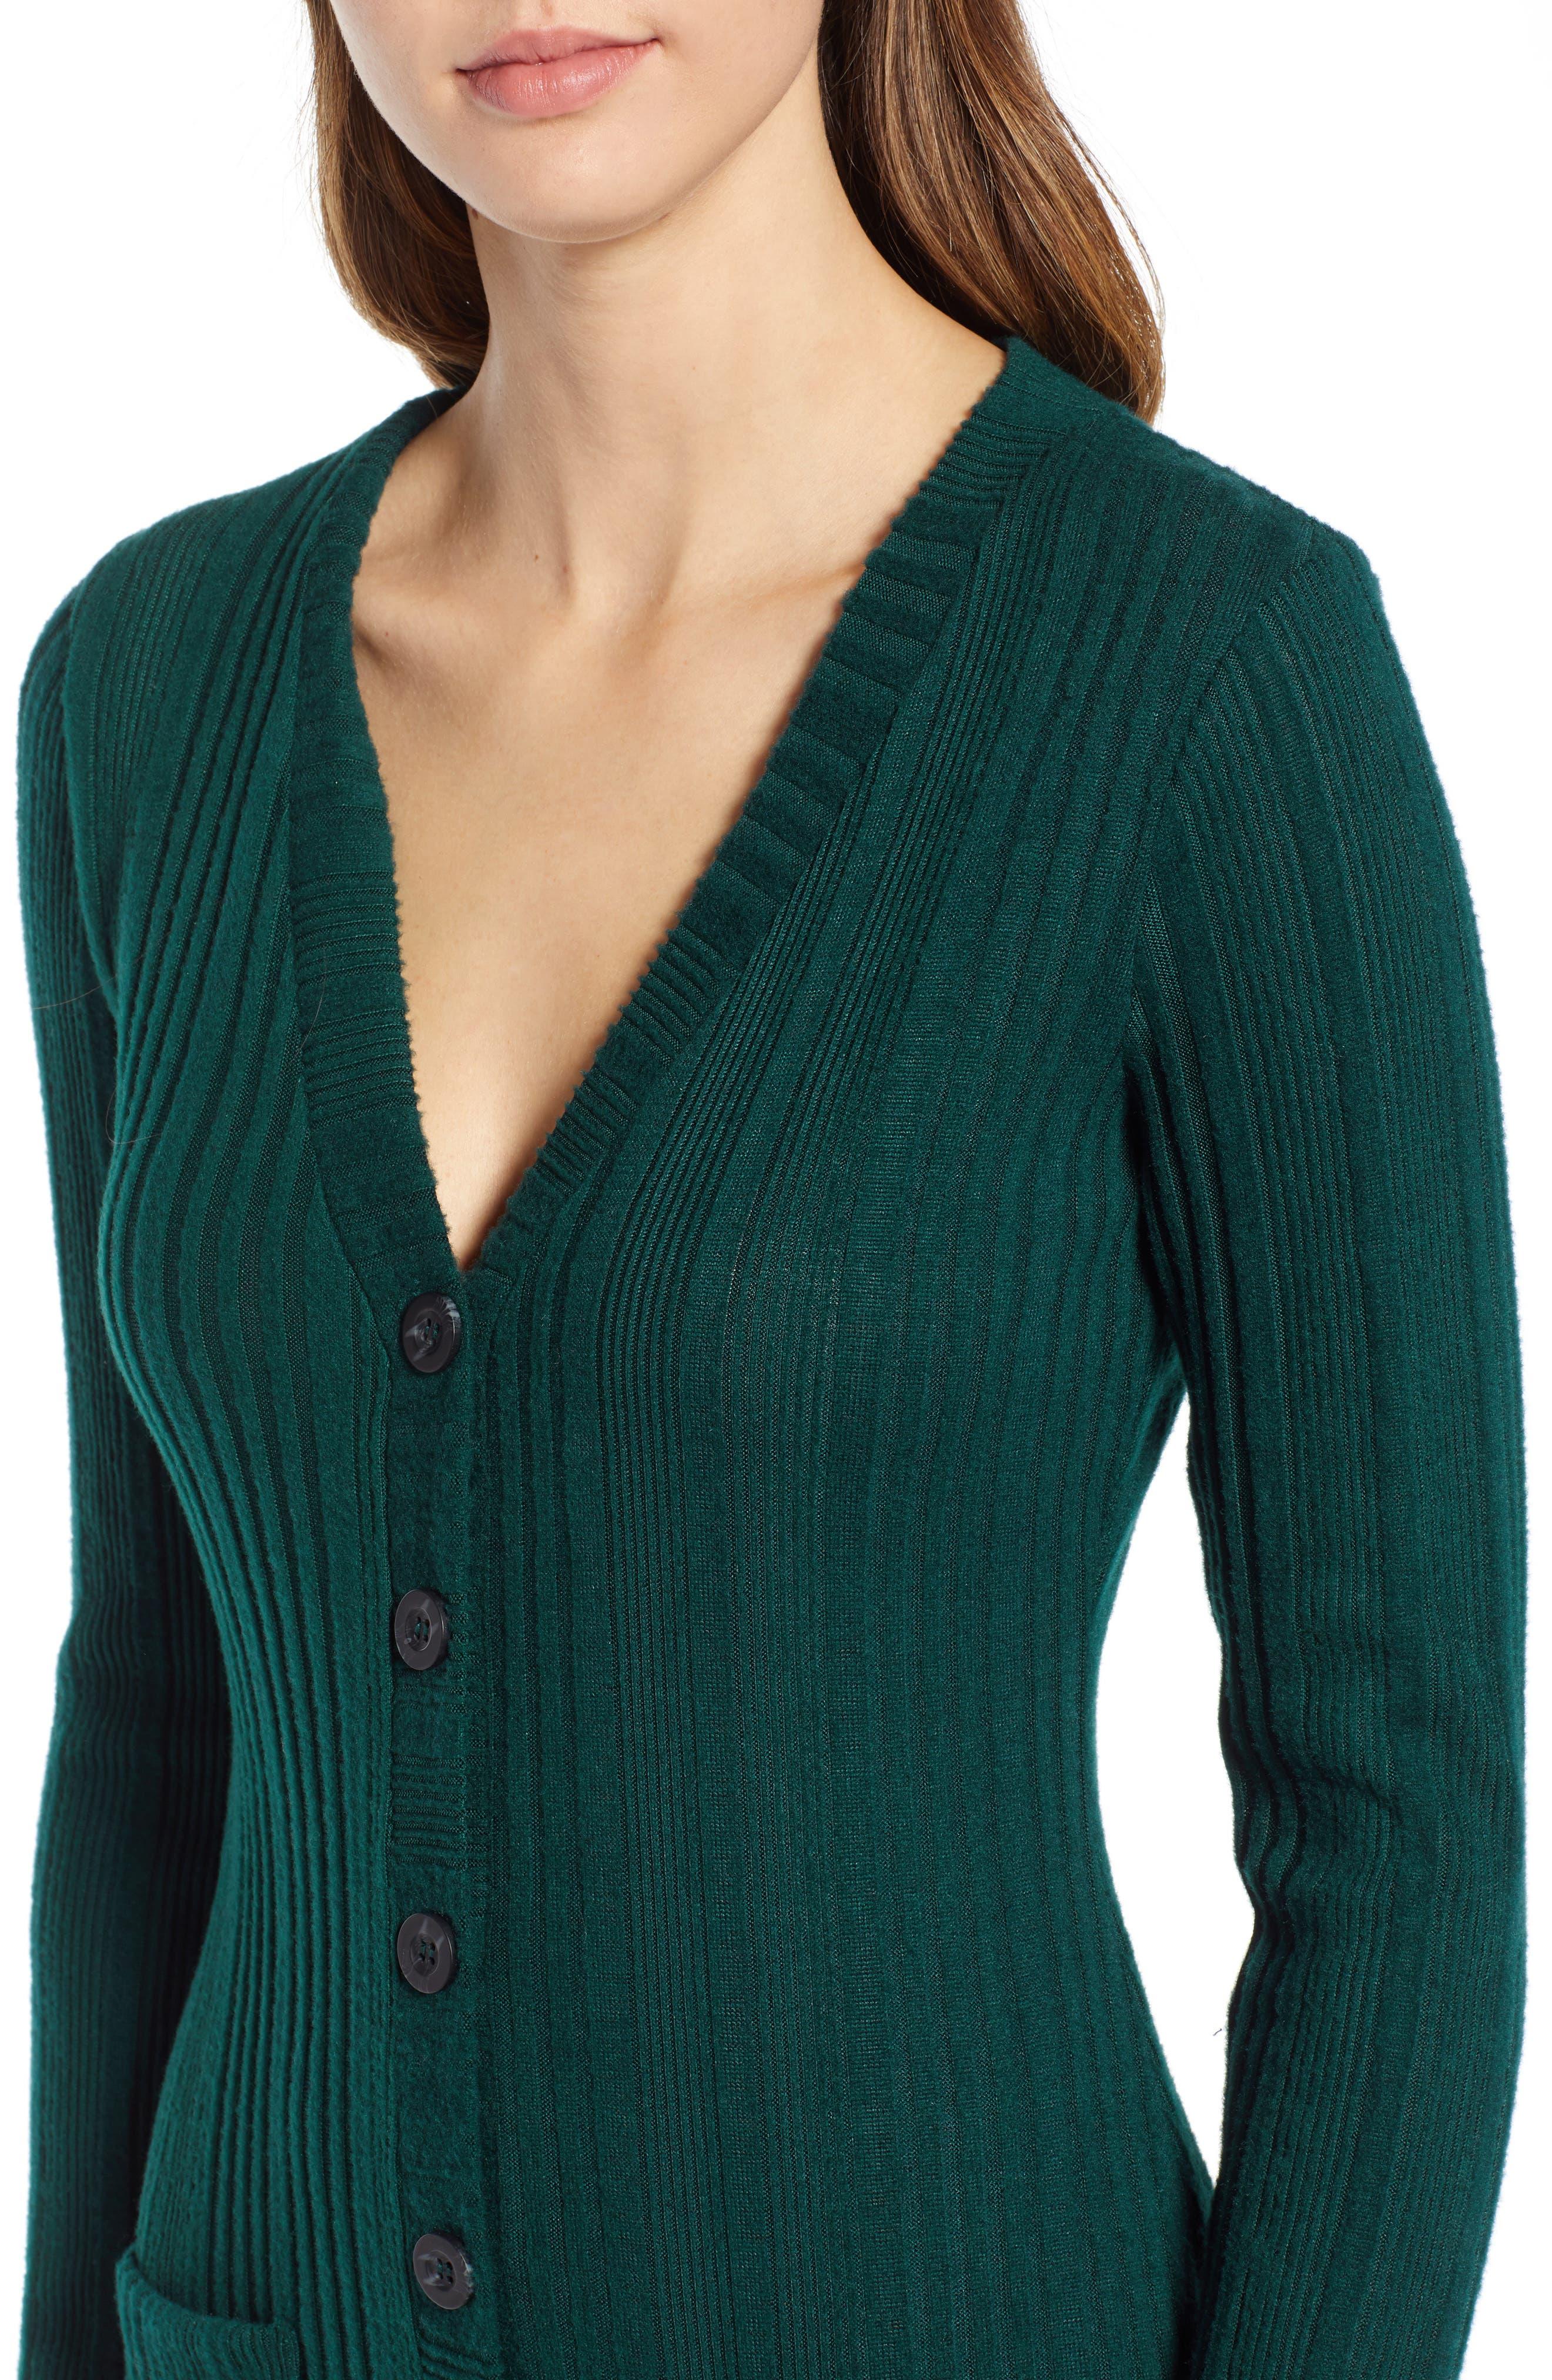 SOCIALITE,                             Sweater Dress,                             Alternate thumbnail 4, color,                             300